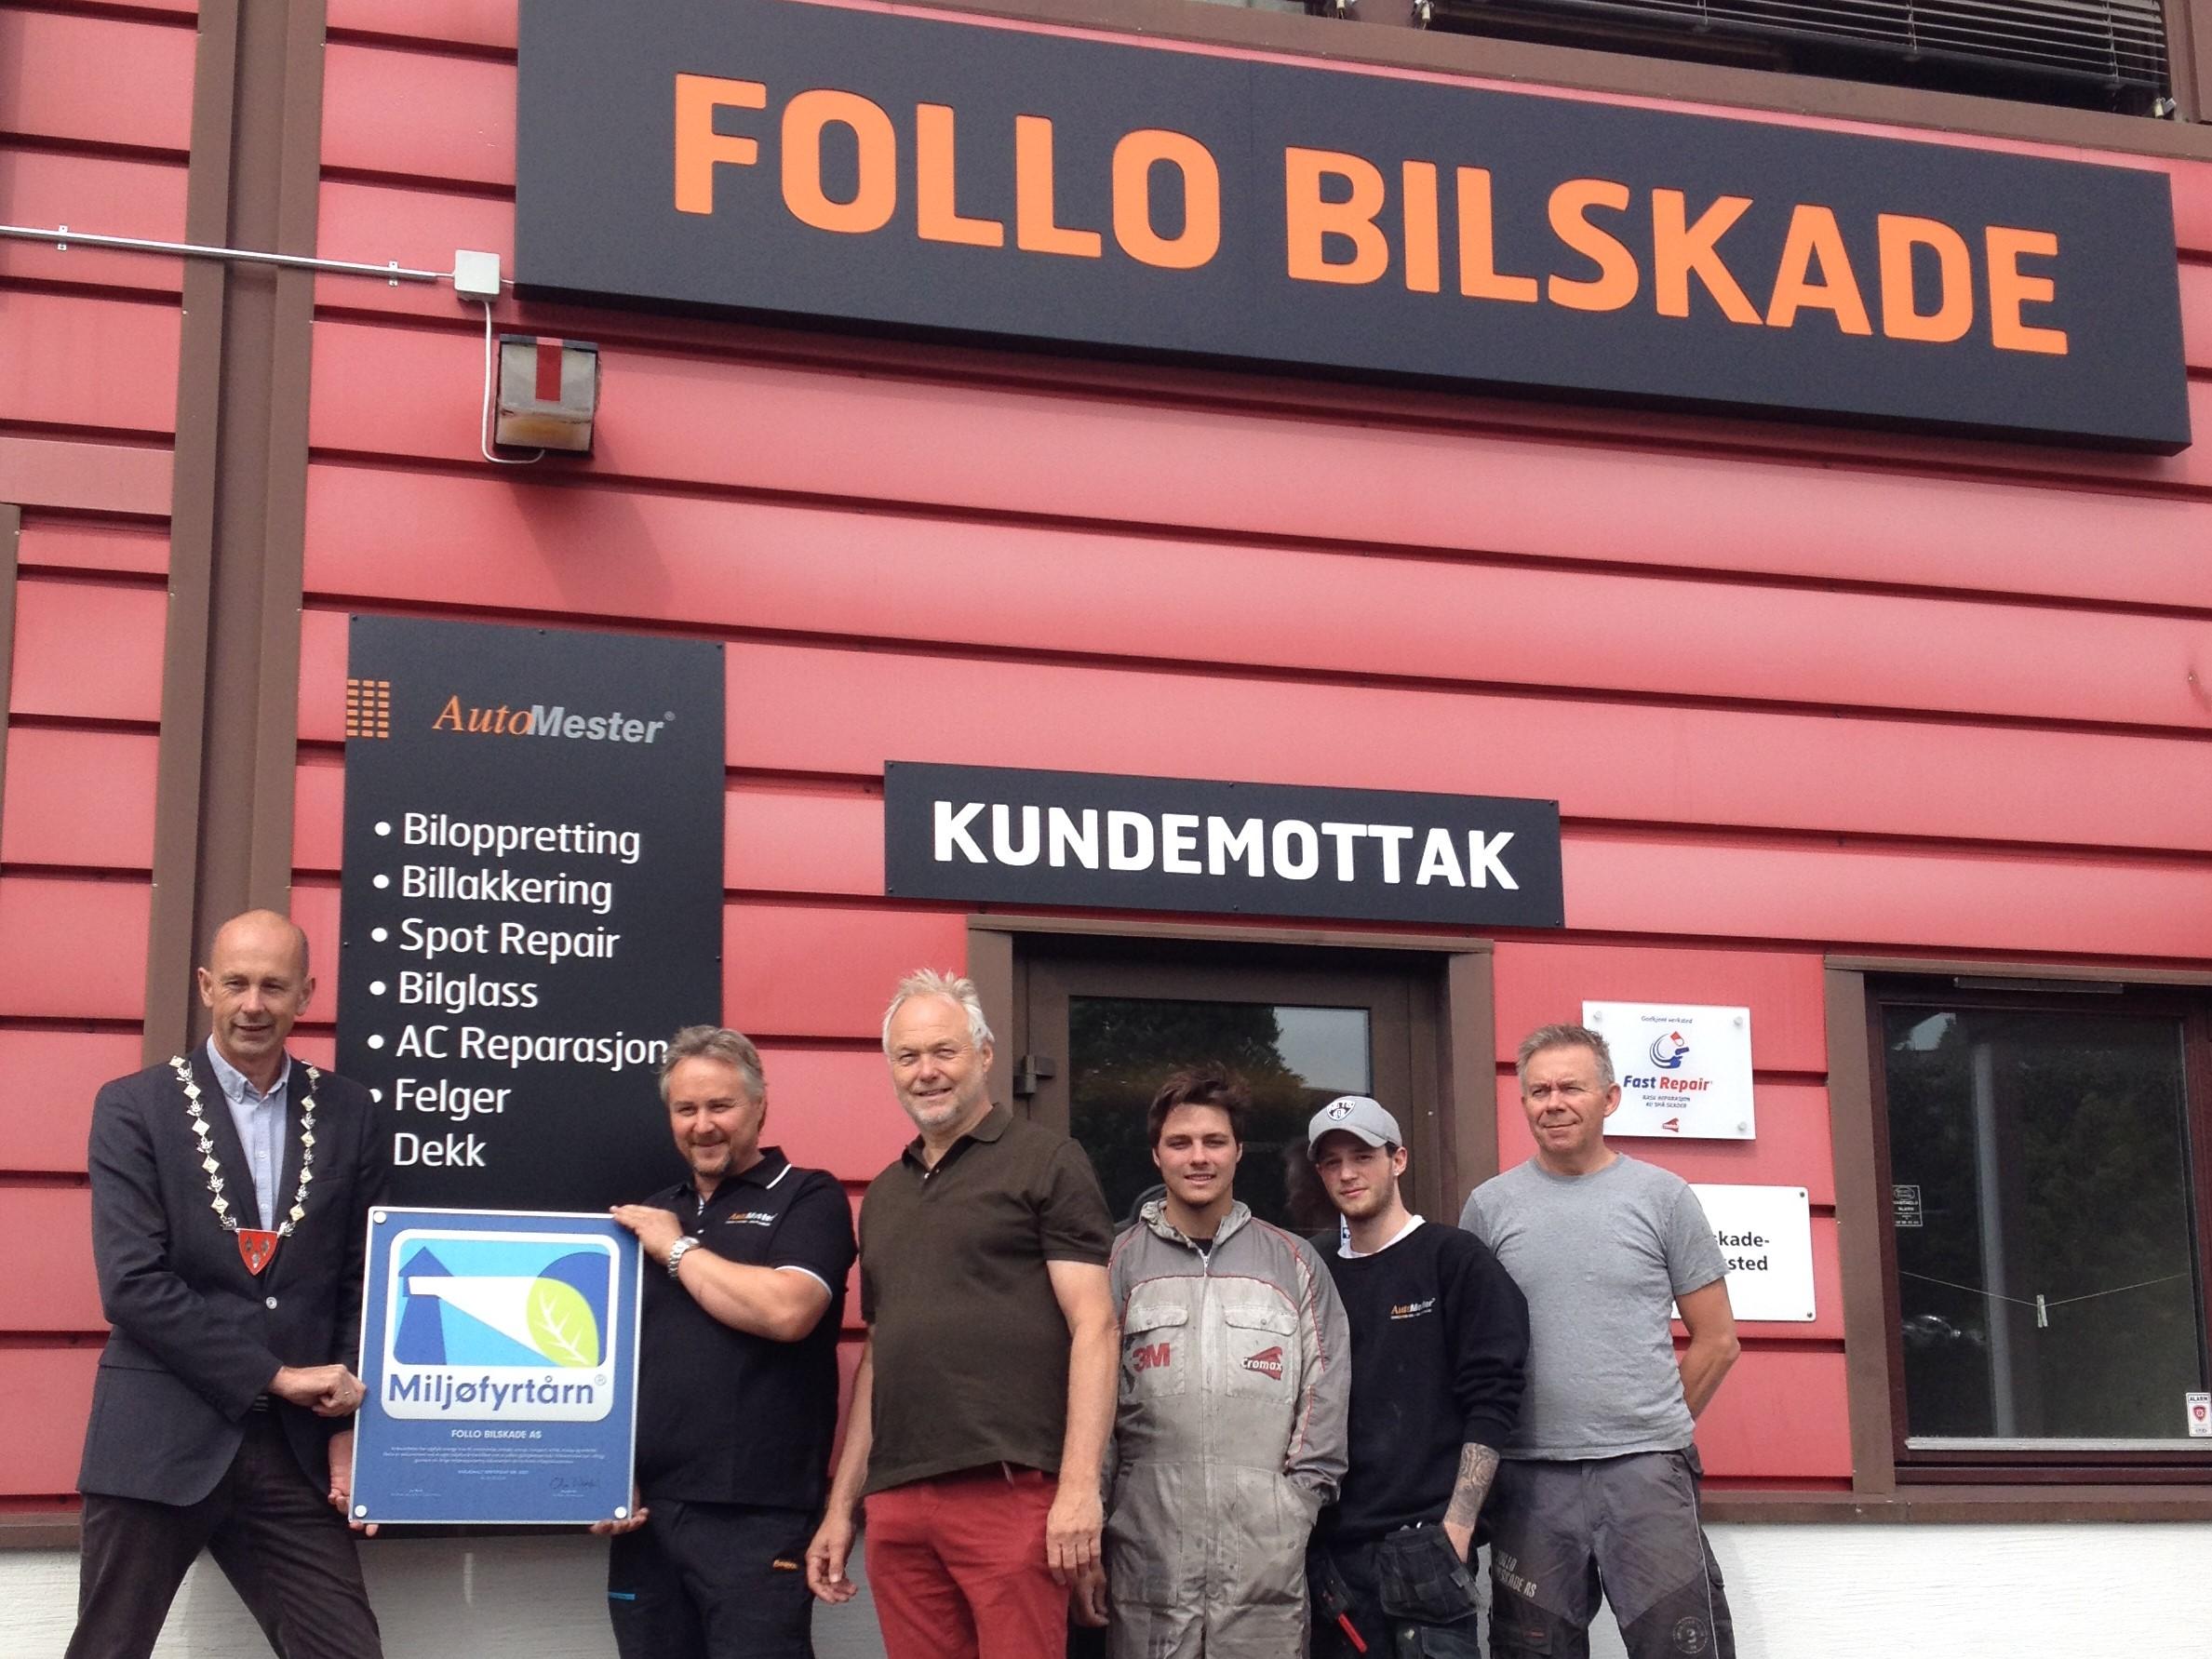 Follo Bilskade - miljøfyrtårn 3